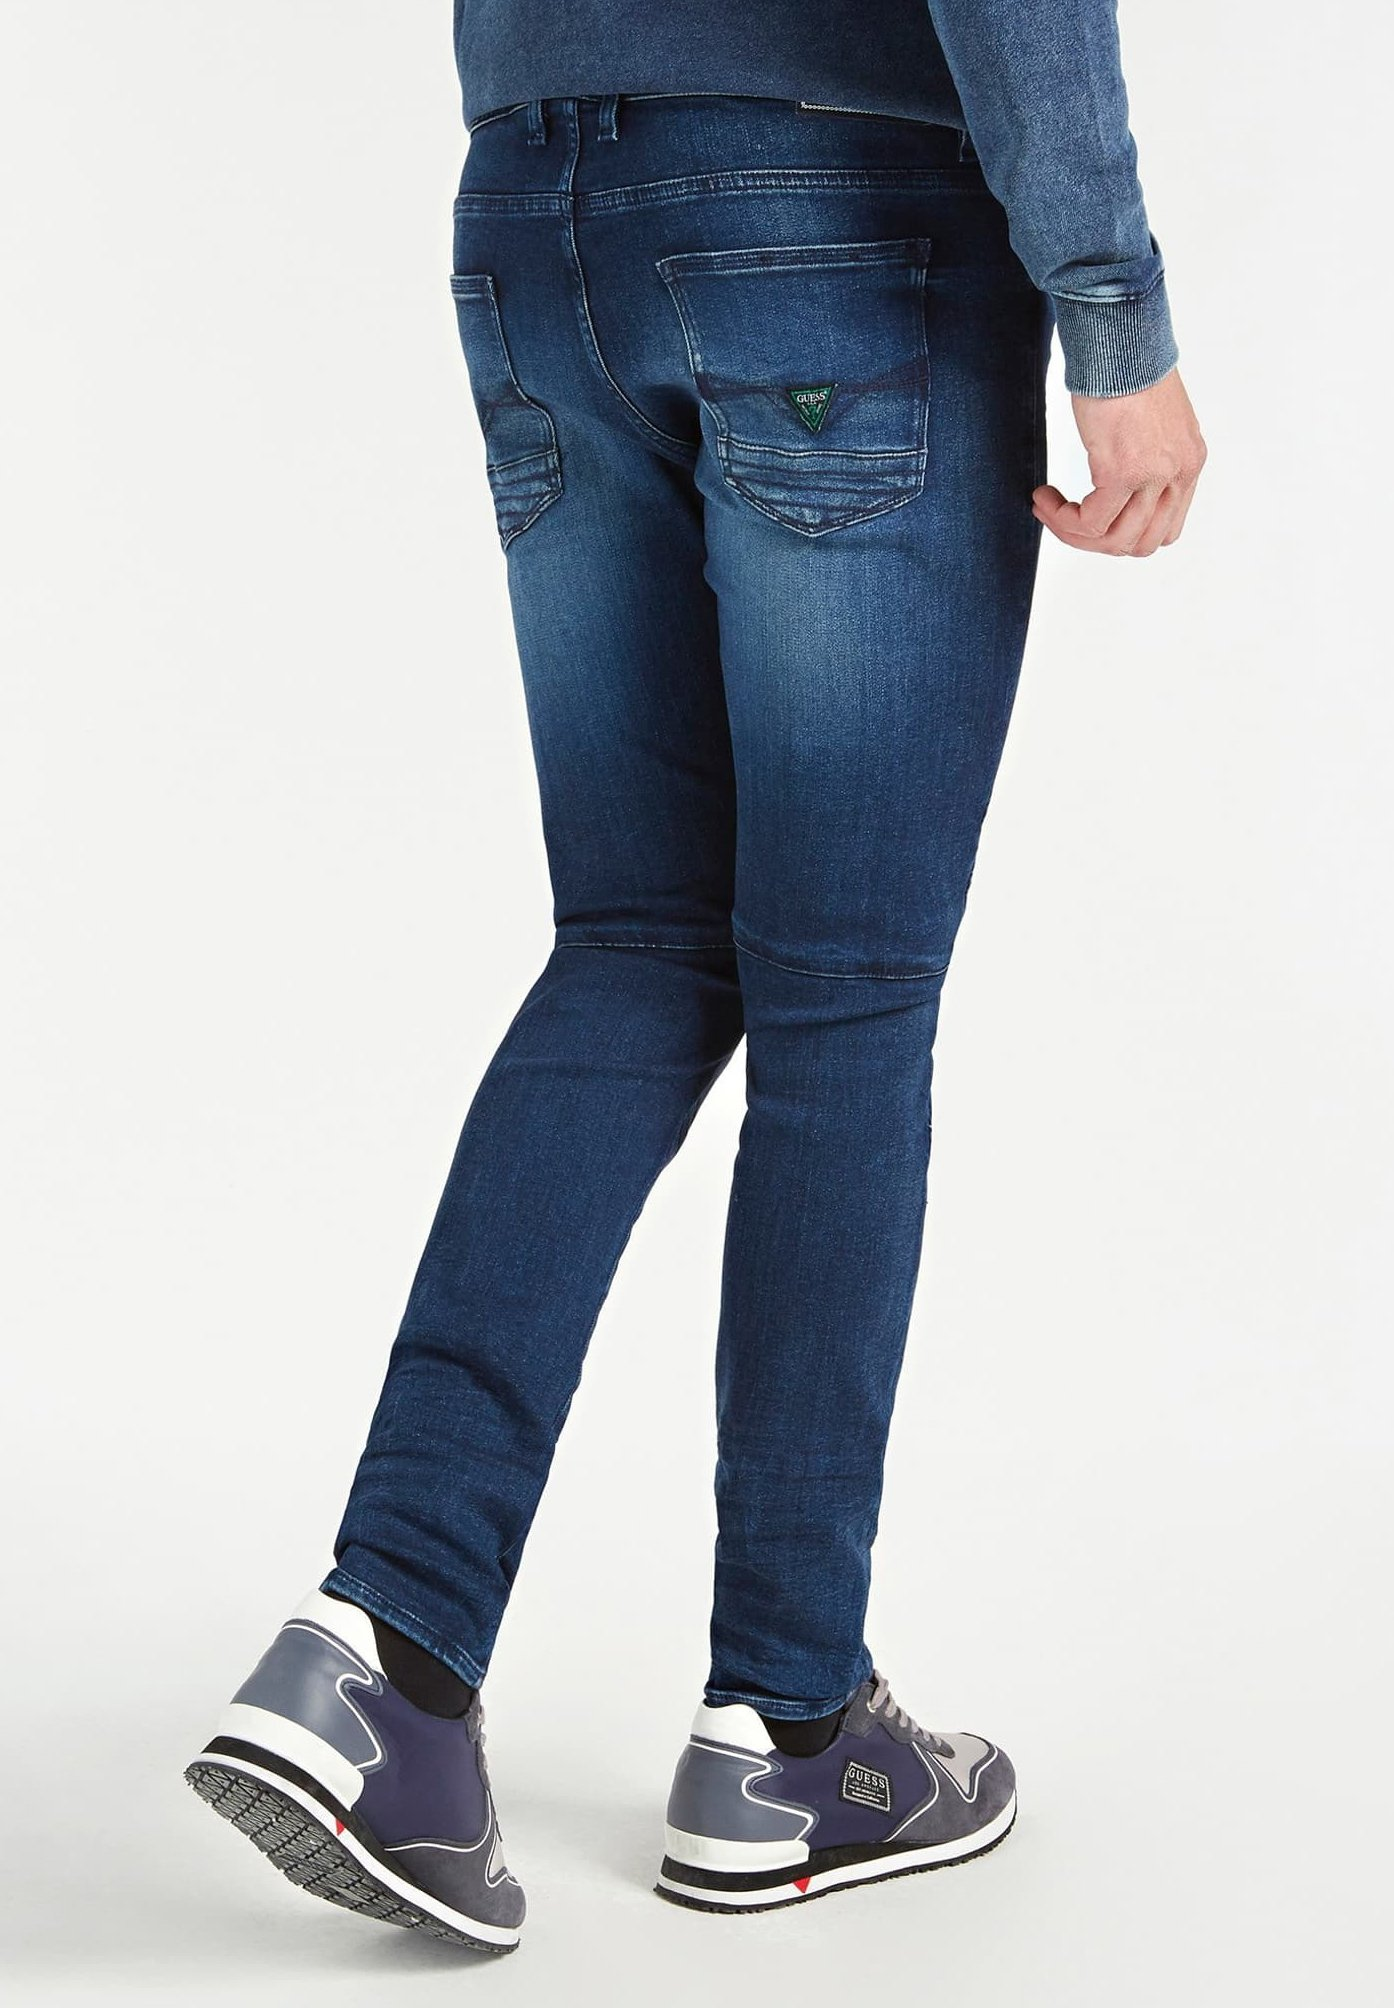 Guess Jeans Skinny Fit dunkelblau Zalando.nl